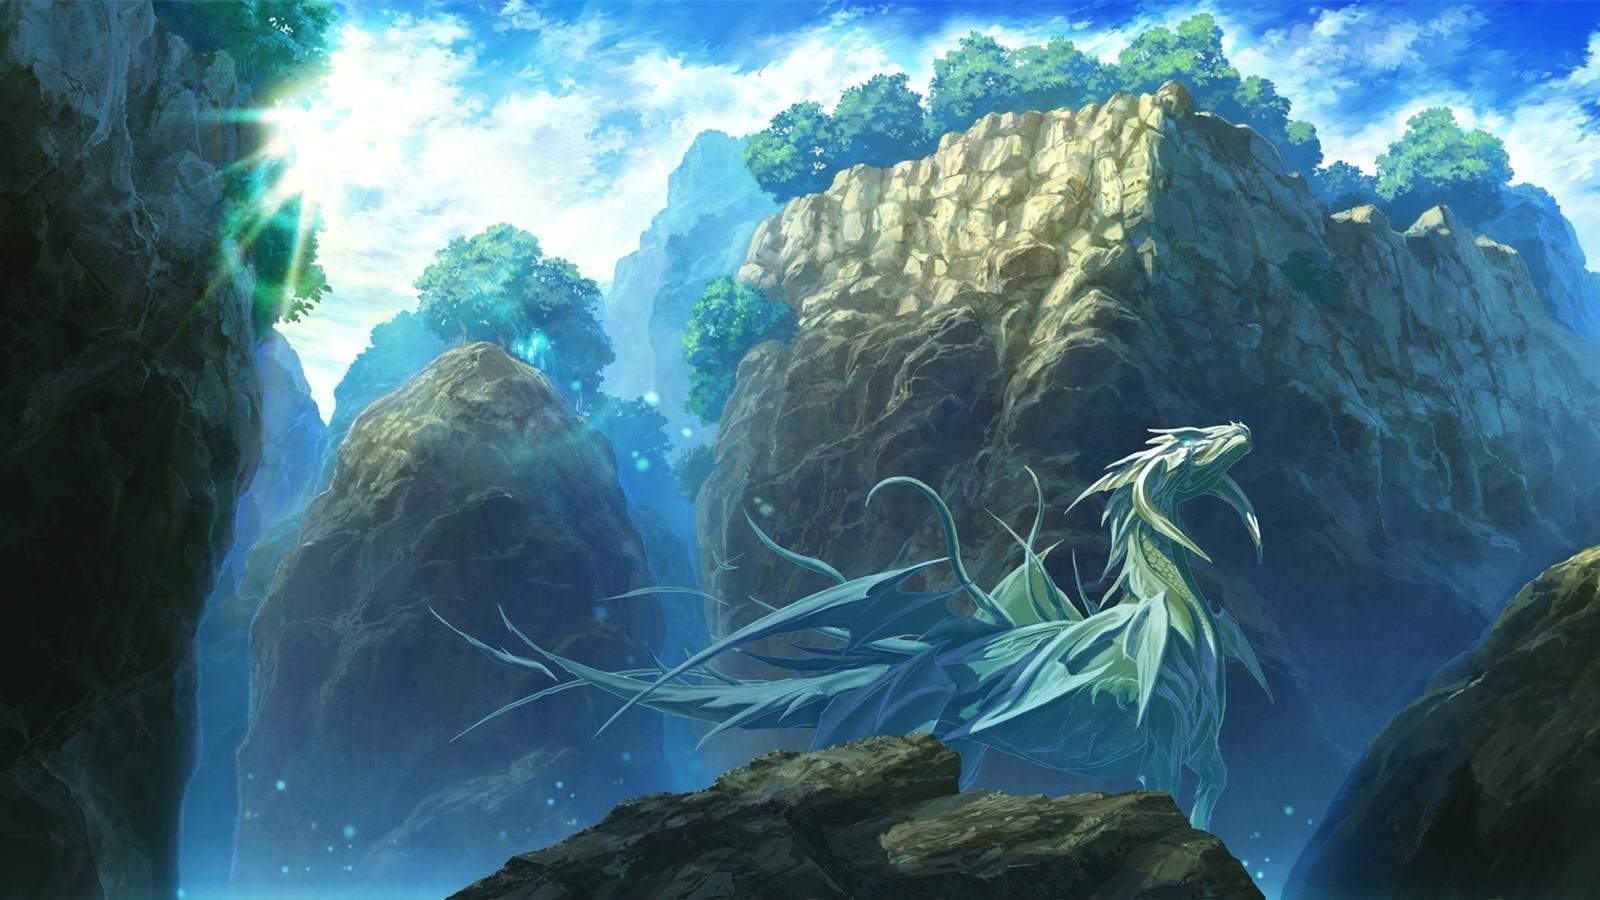 деревья, дракон, Арт, пейзаж, mstk, горы